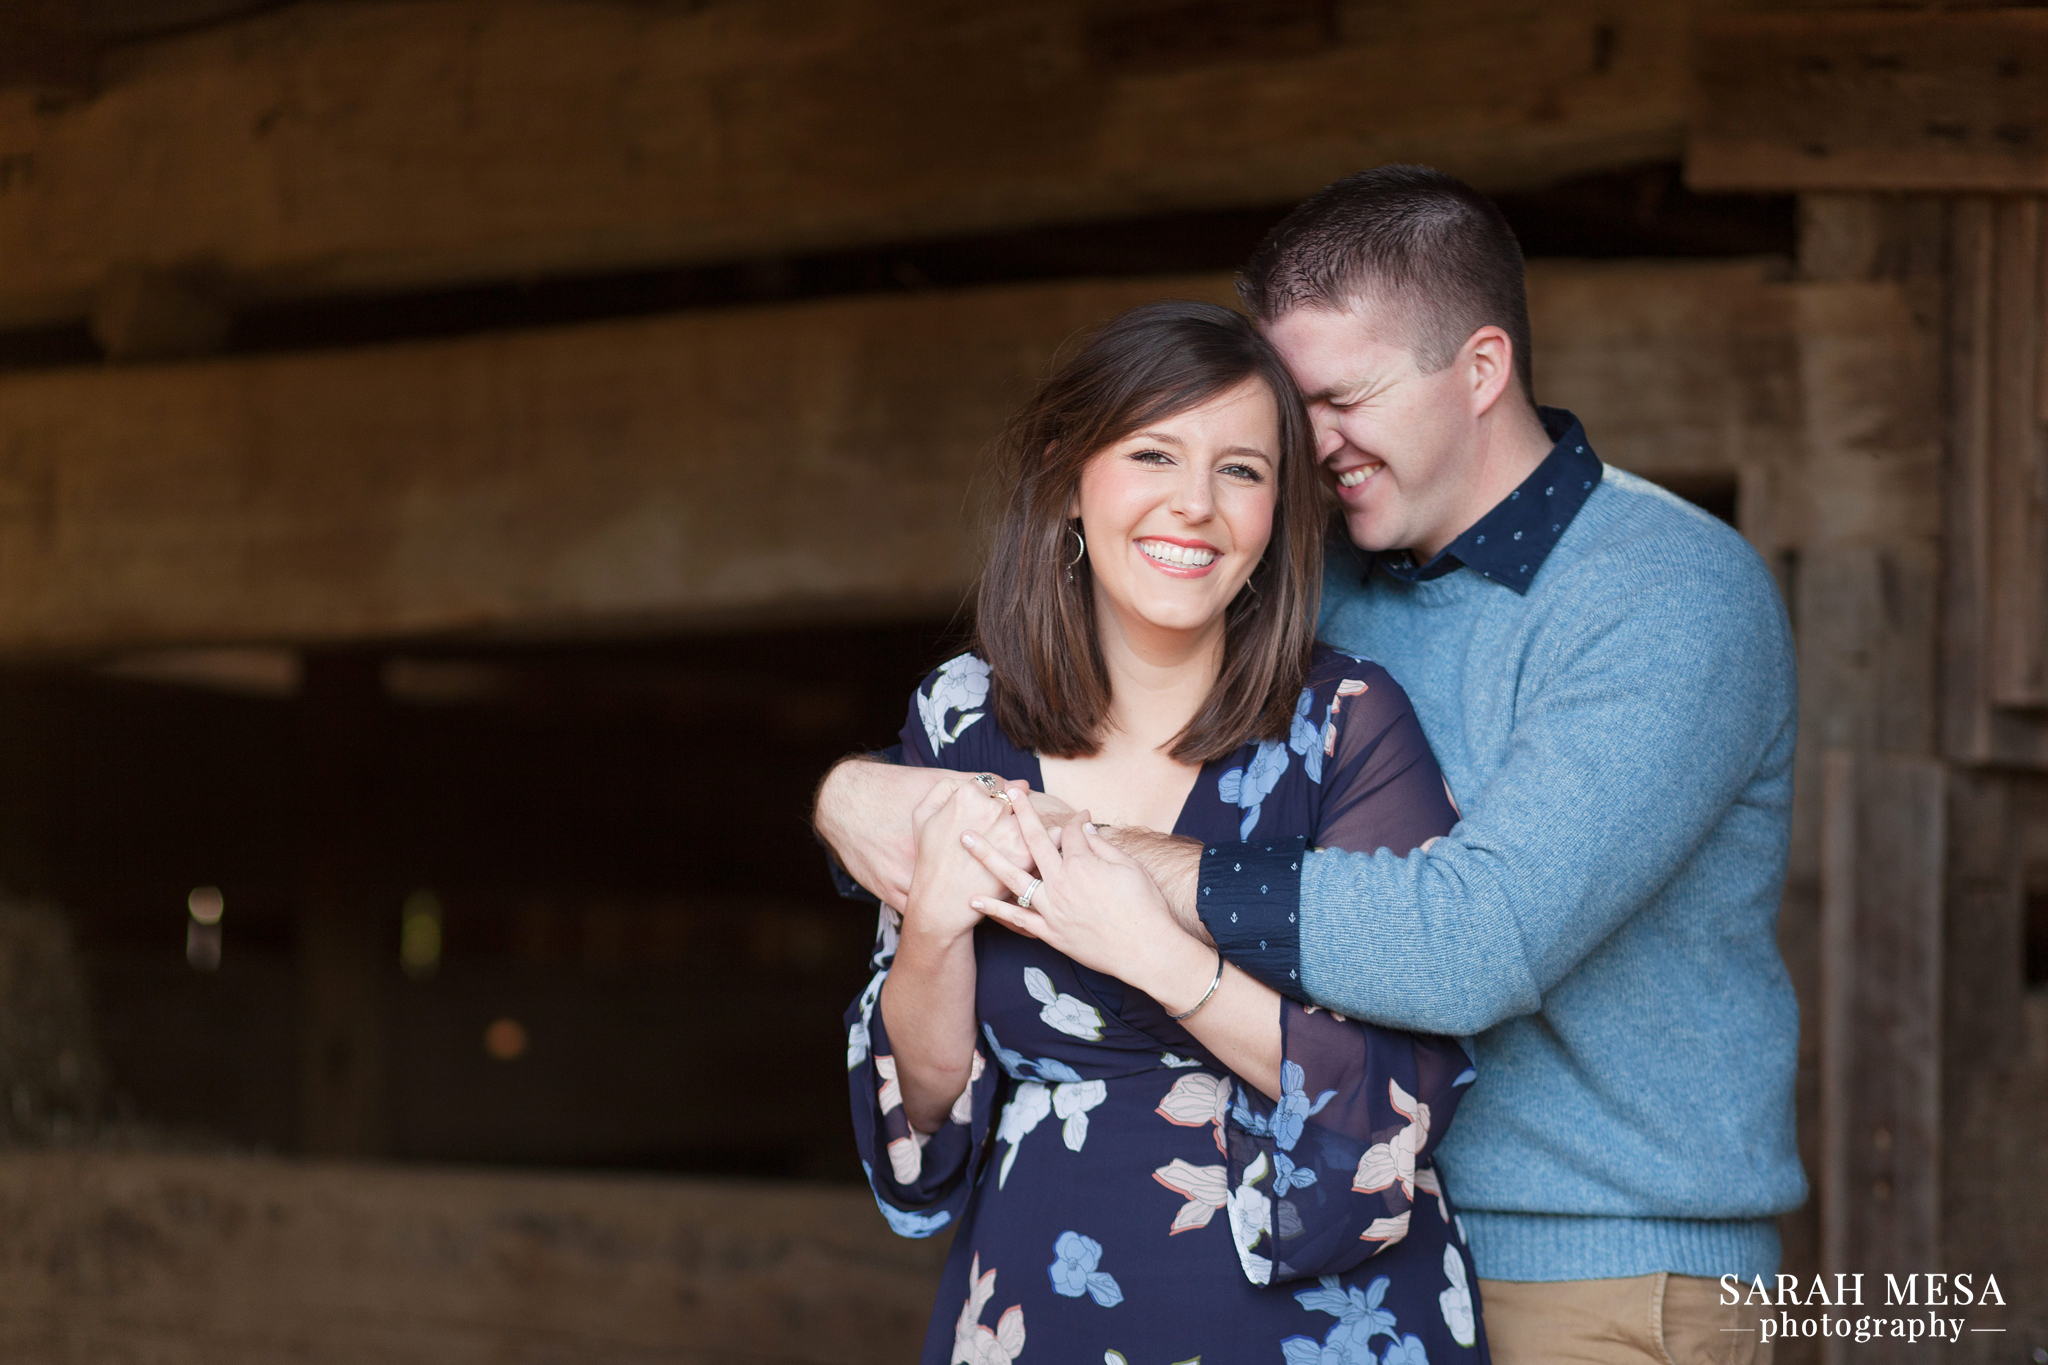 Sarah Mesa Photography   Louisville Family and Portrait Photographer